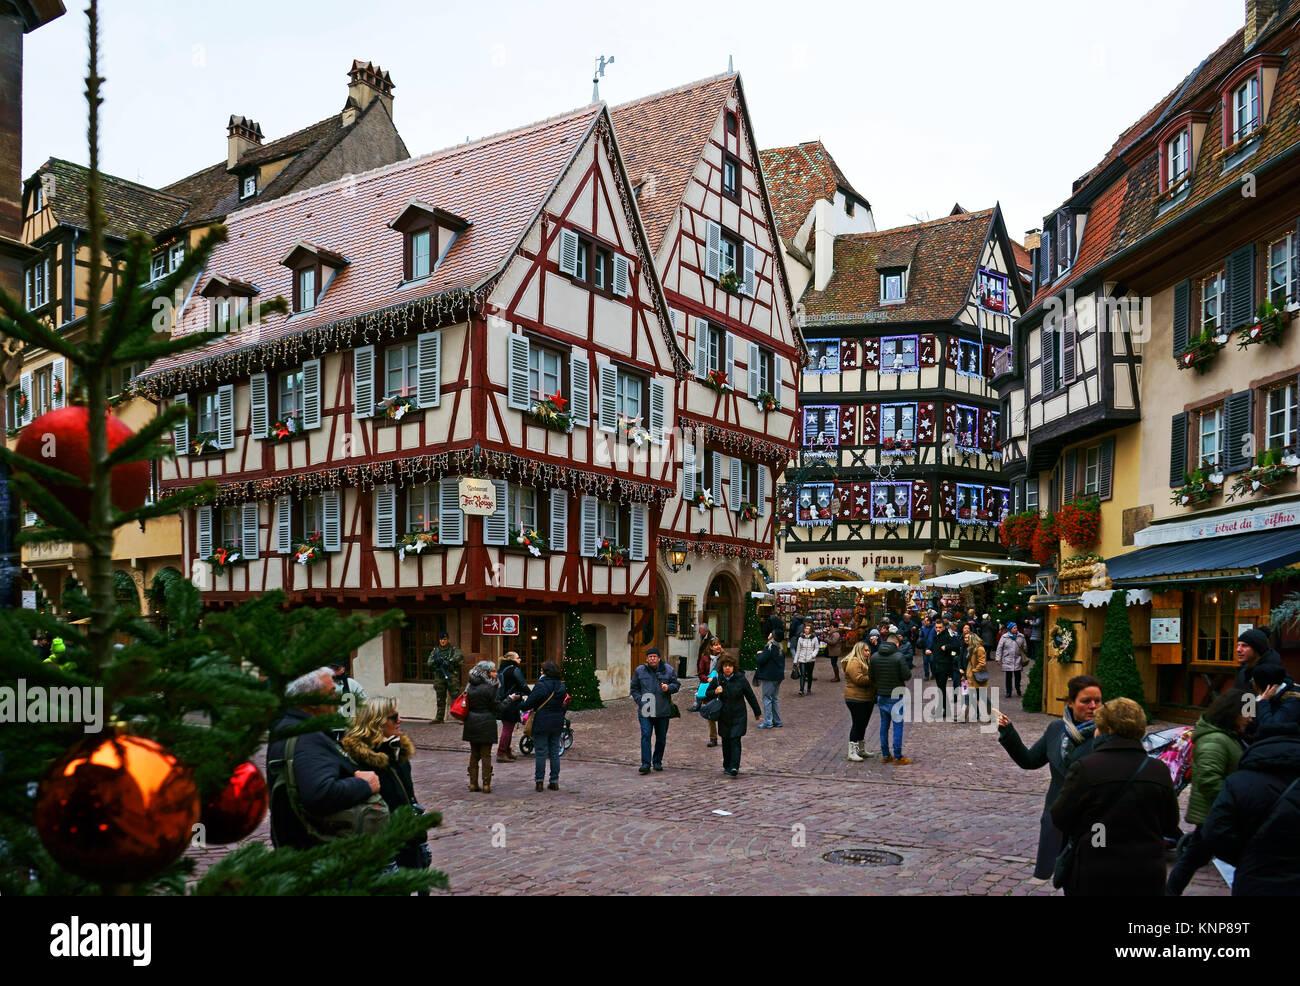 Colmar Christmas Market.Colmar Christmas Market Stock Photos Colmar Christmas